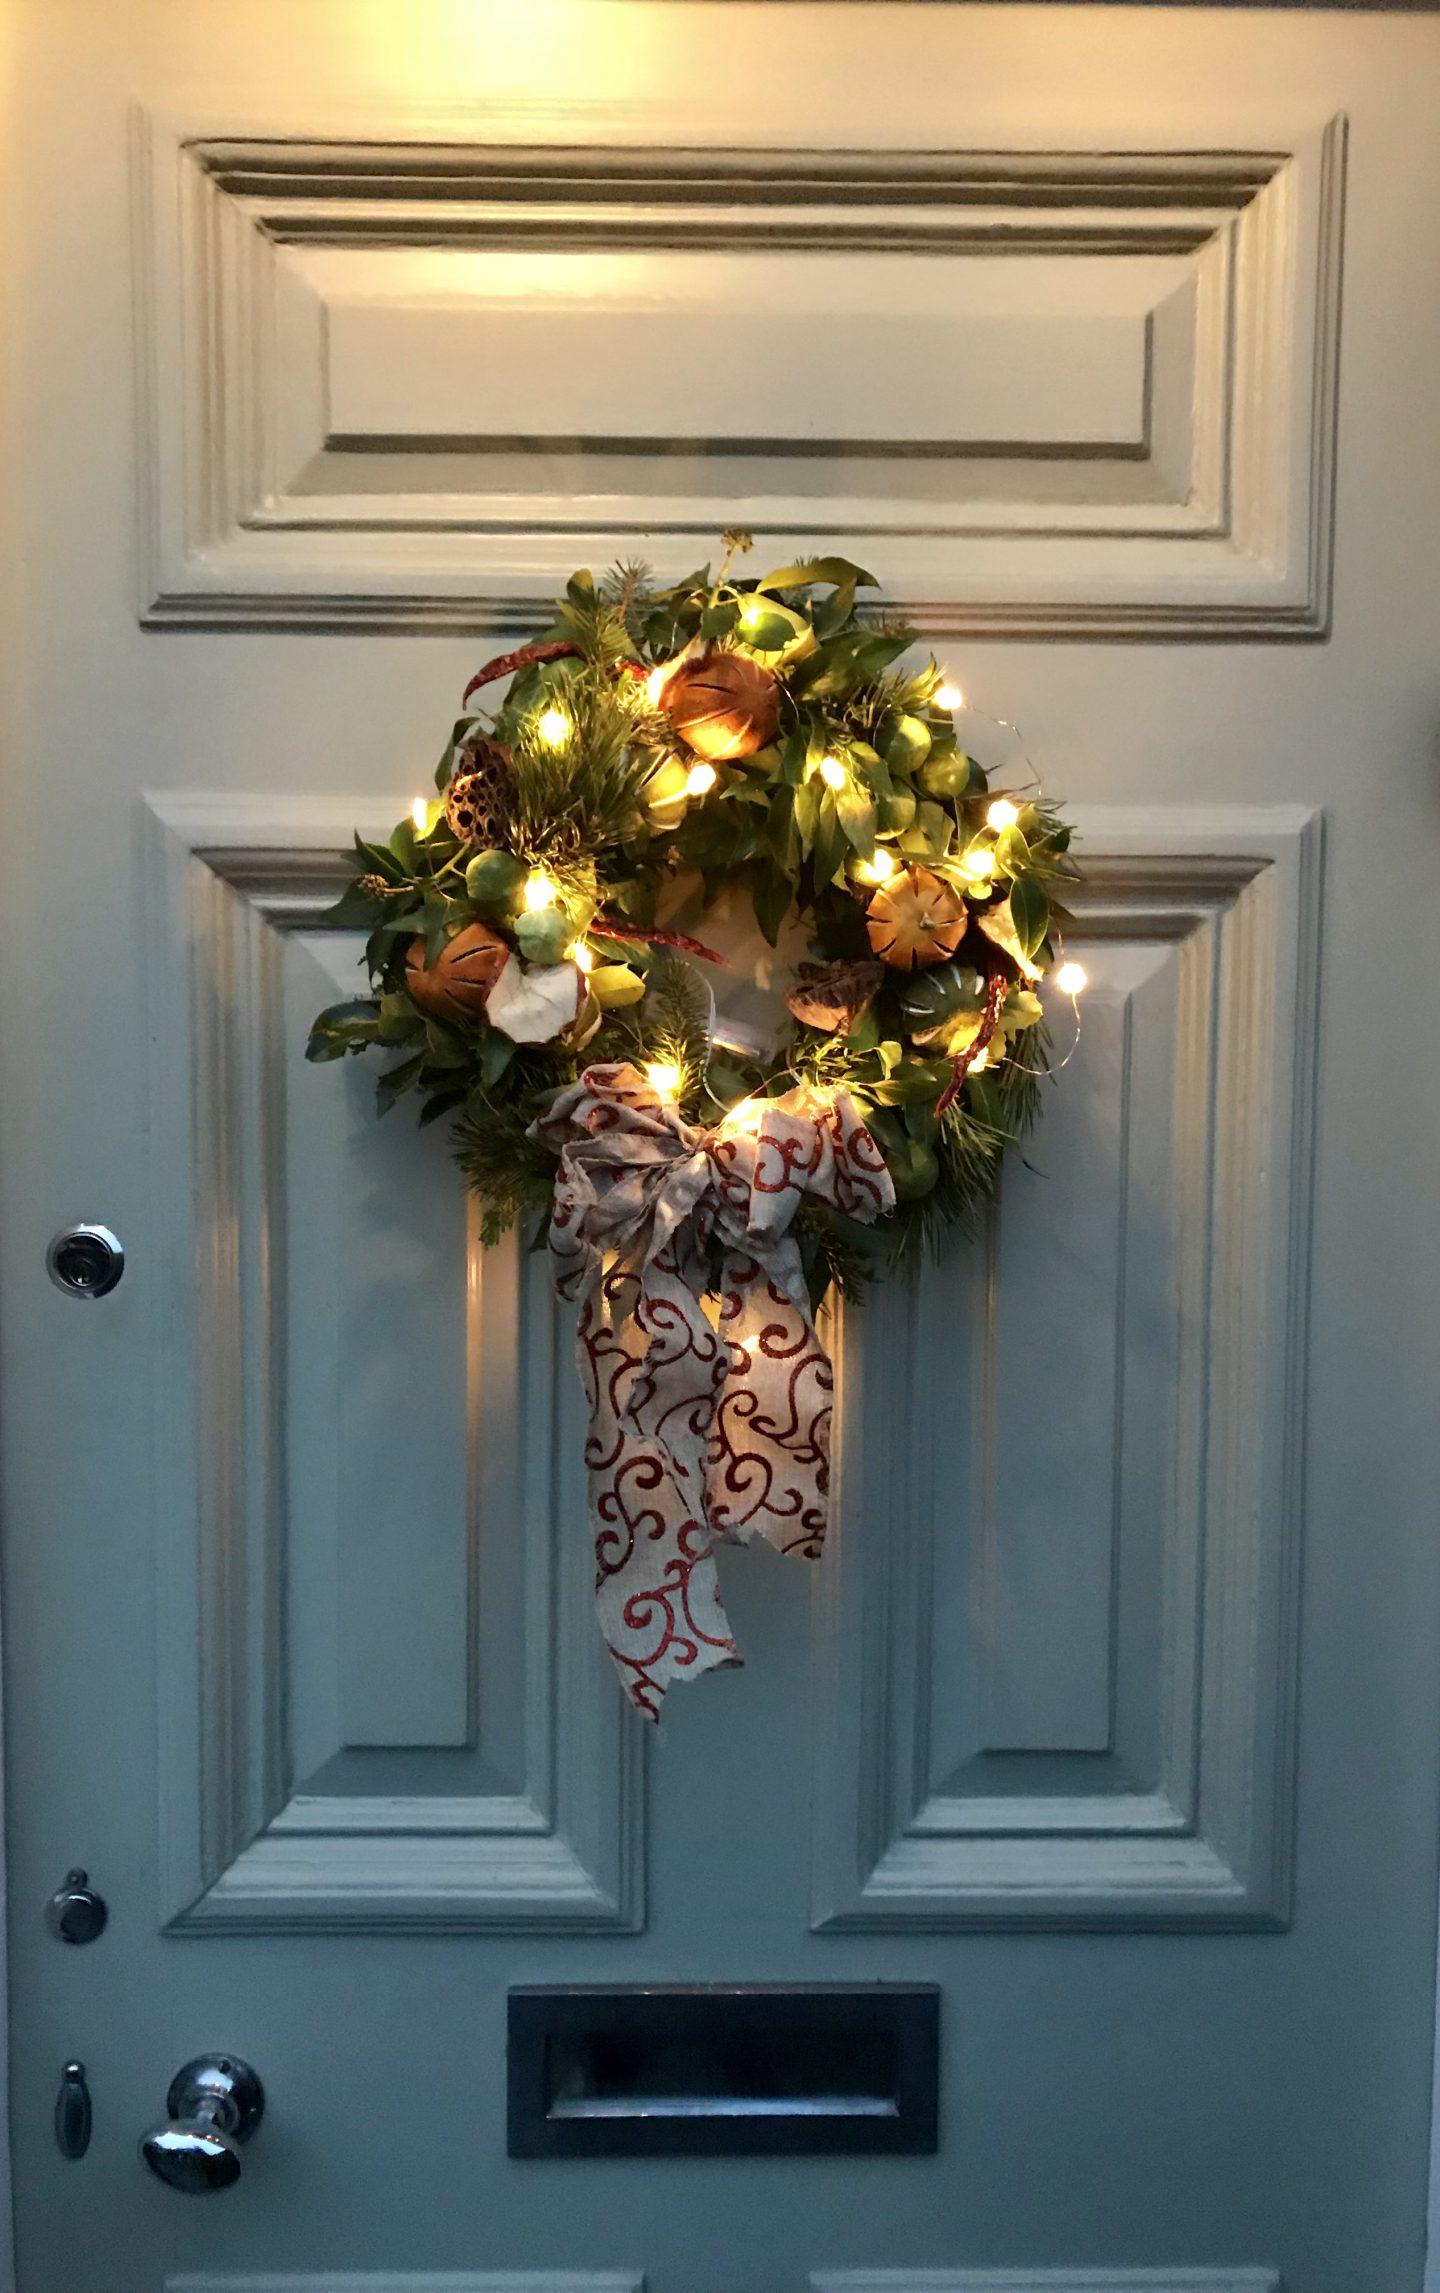 How _To _Make_ A _Christmas _Wreath